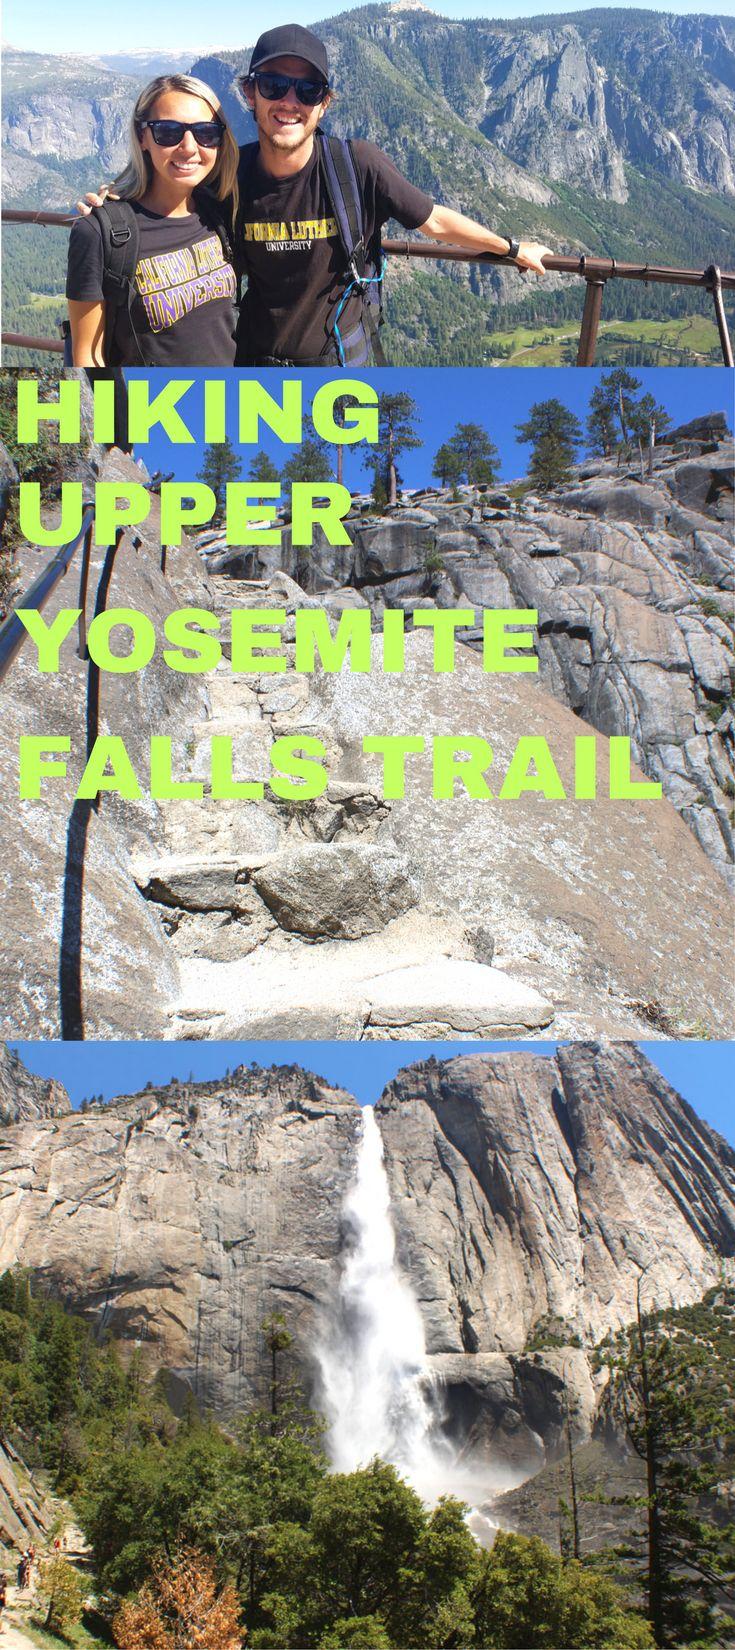 Hiking The Upper Yosemite Falls Trail in